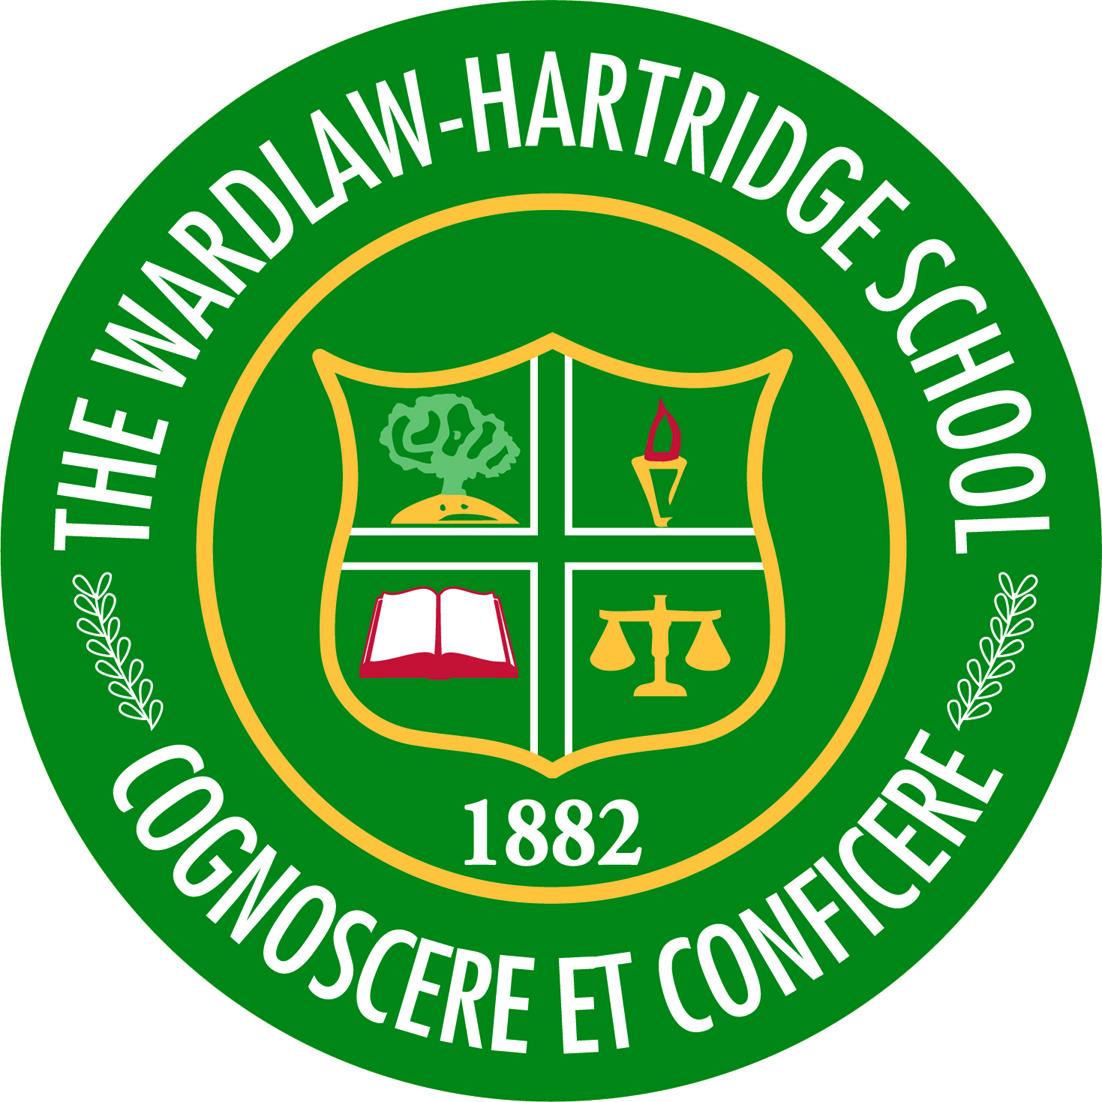 2e35518b876d4362b844_Wardlaw_Hartridge_logo.jpg